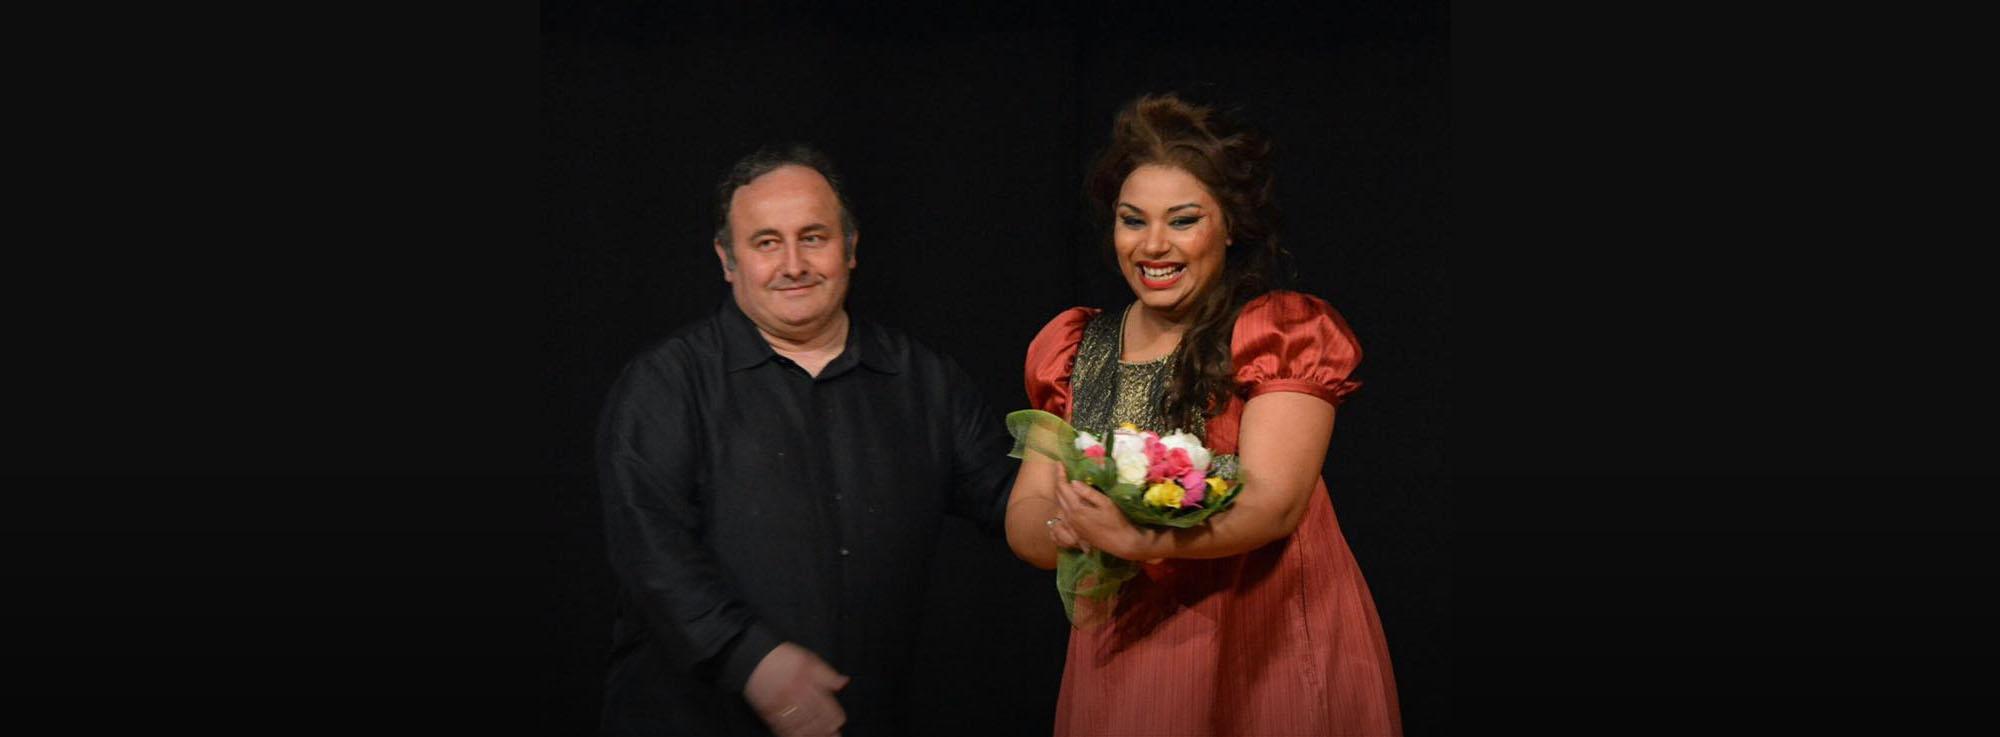 Barletta: Tosca